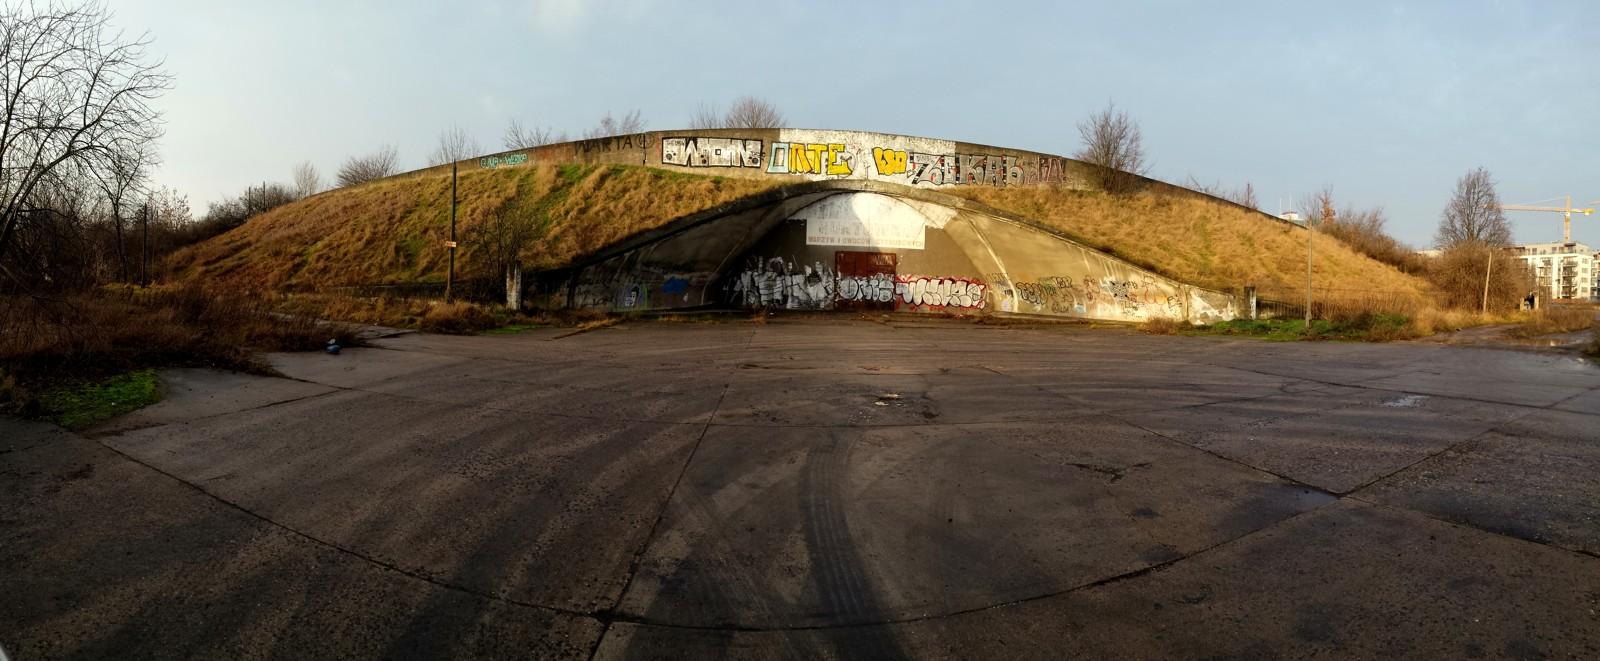 Stadion Edmunda Szyca